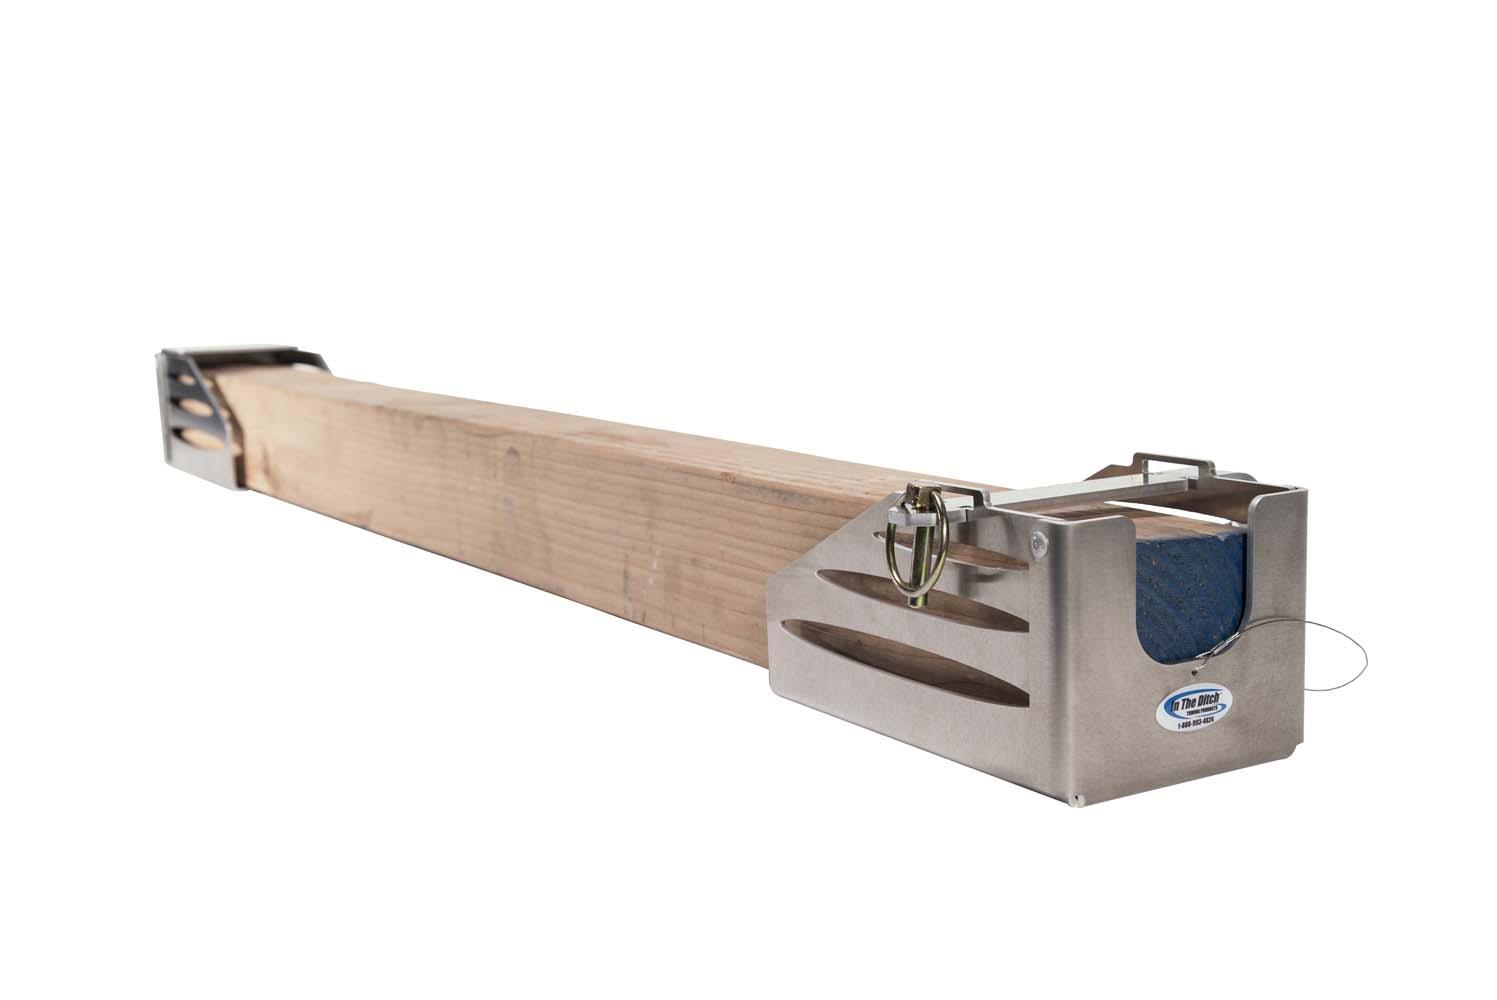 ITD11676 4x4 lumber holder 2